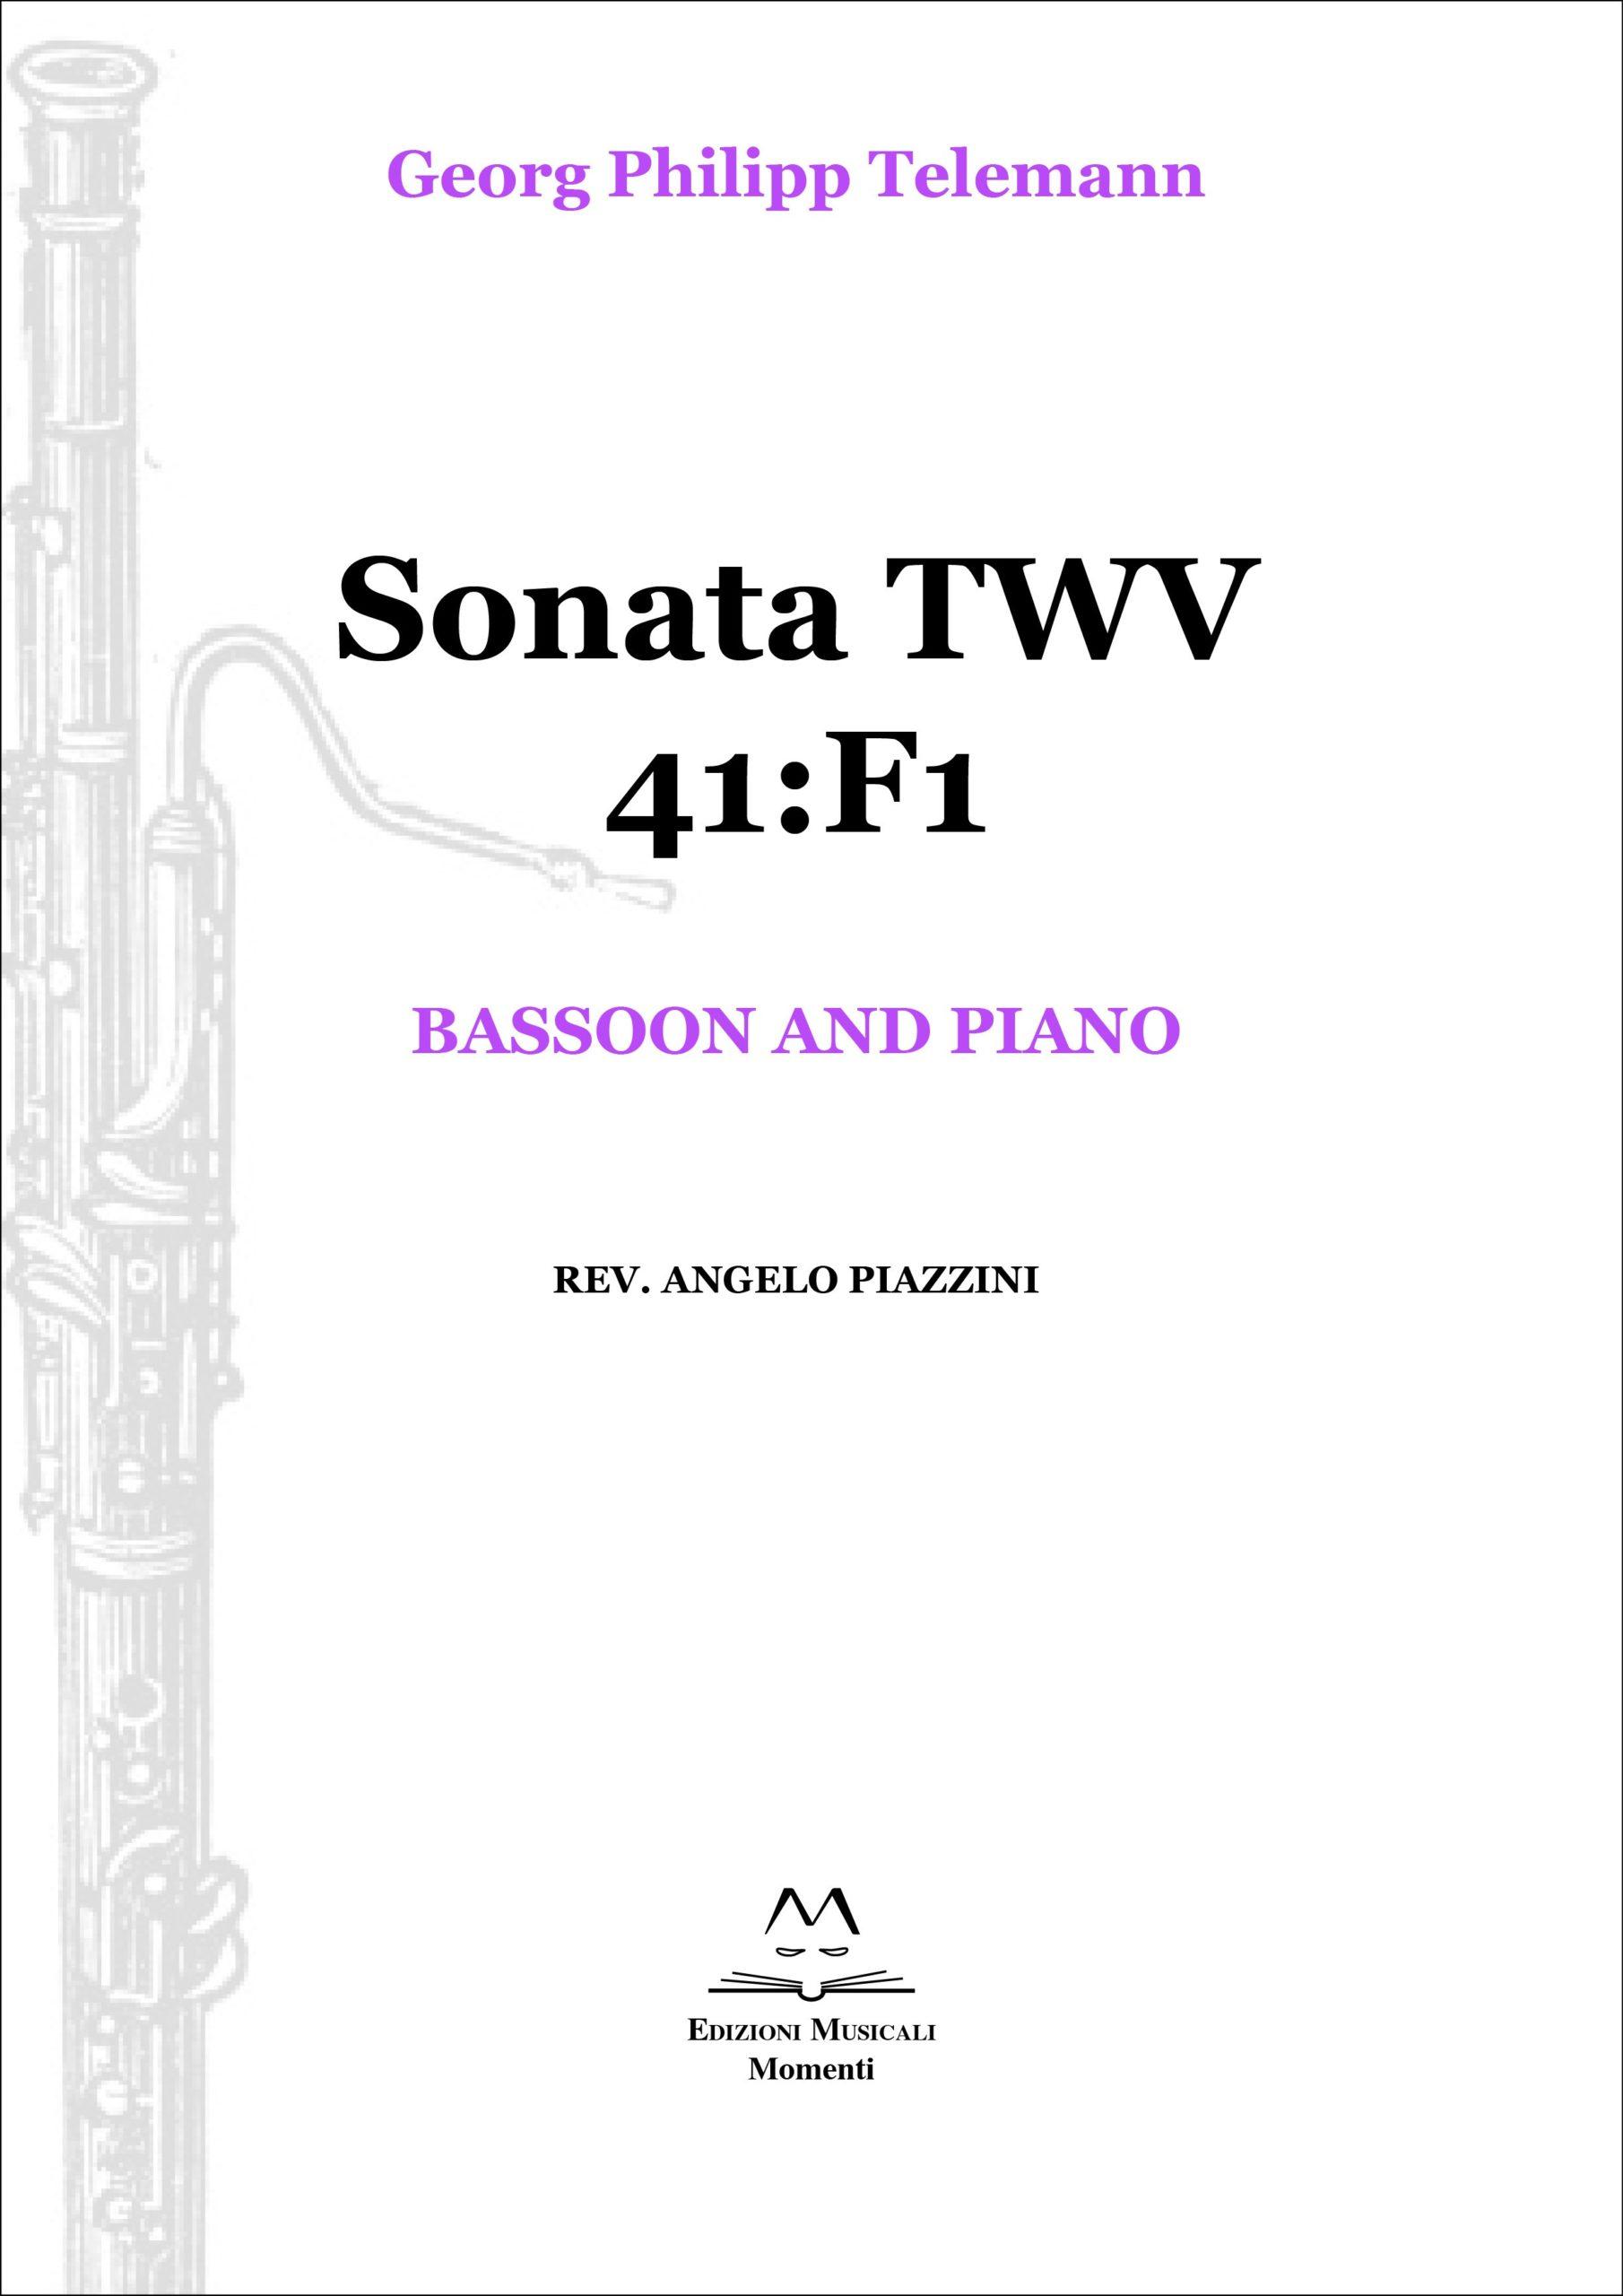 Sonata TWV 41:F1 - Bassoon and piano rev. Angelo Piazzini